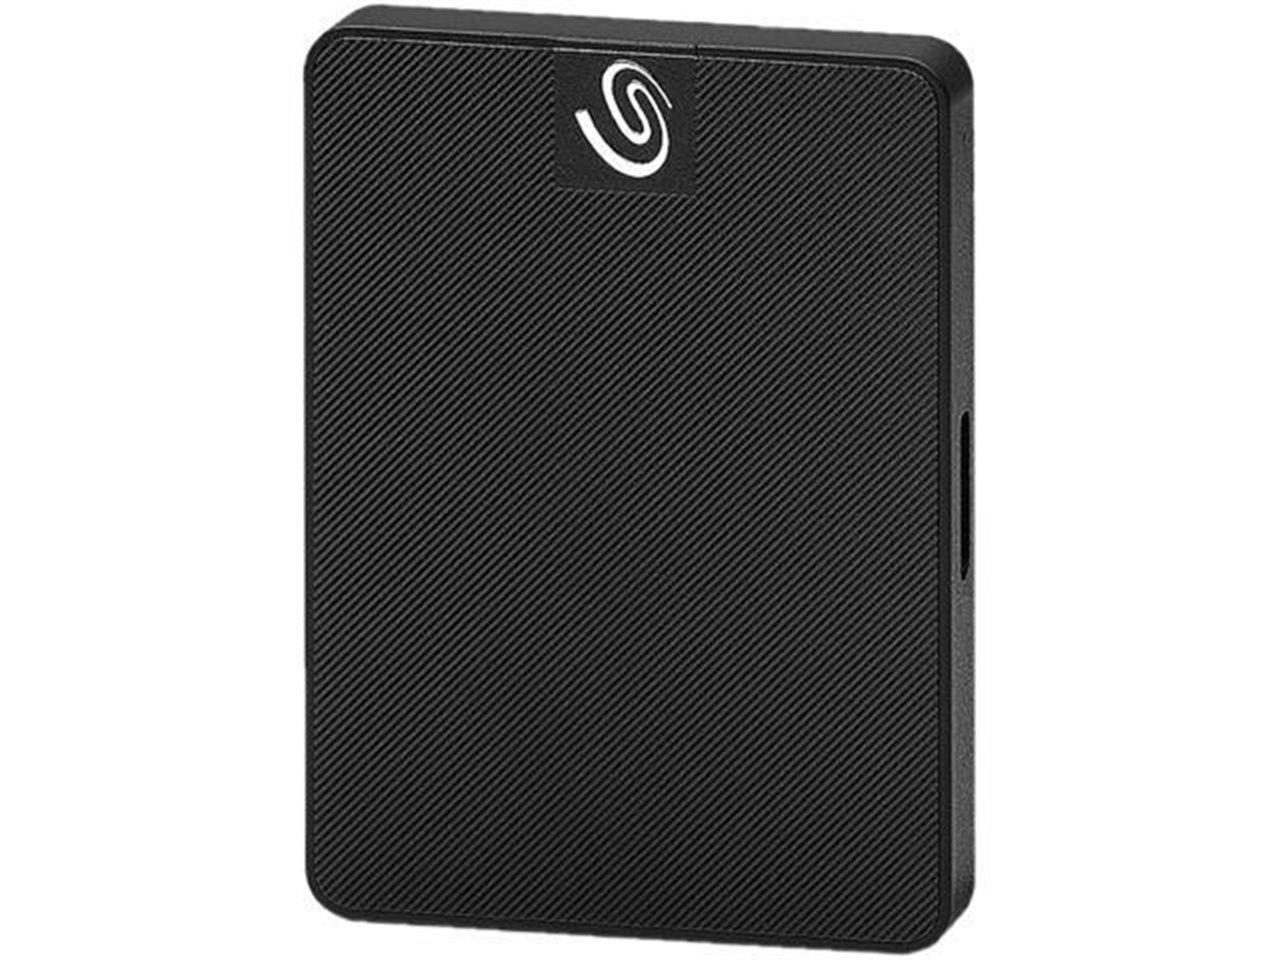 Seagate Expansion SSD 500GB black STJD500400